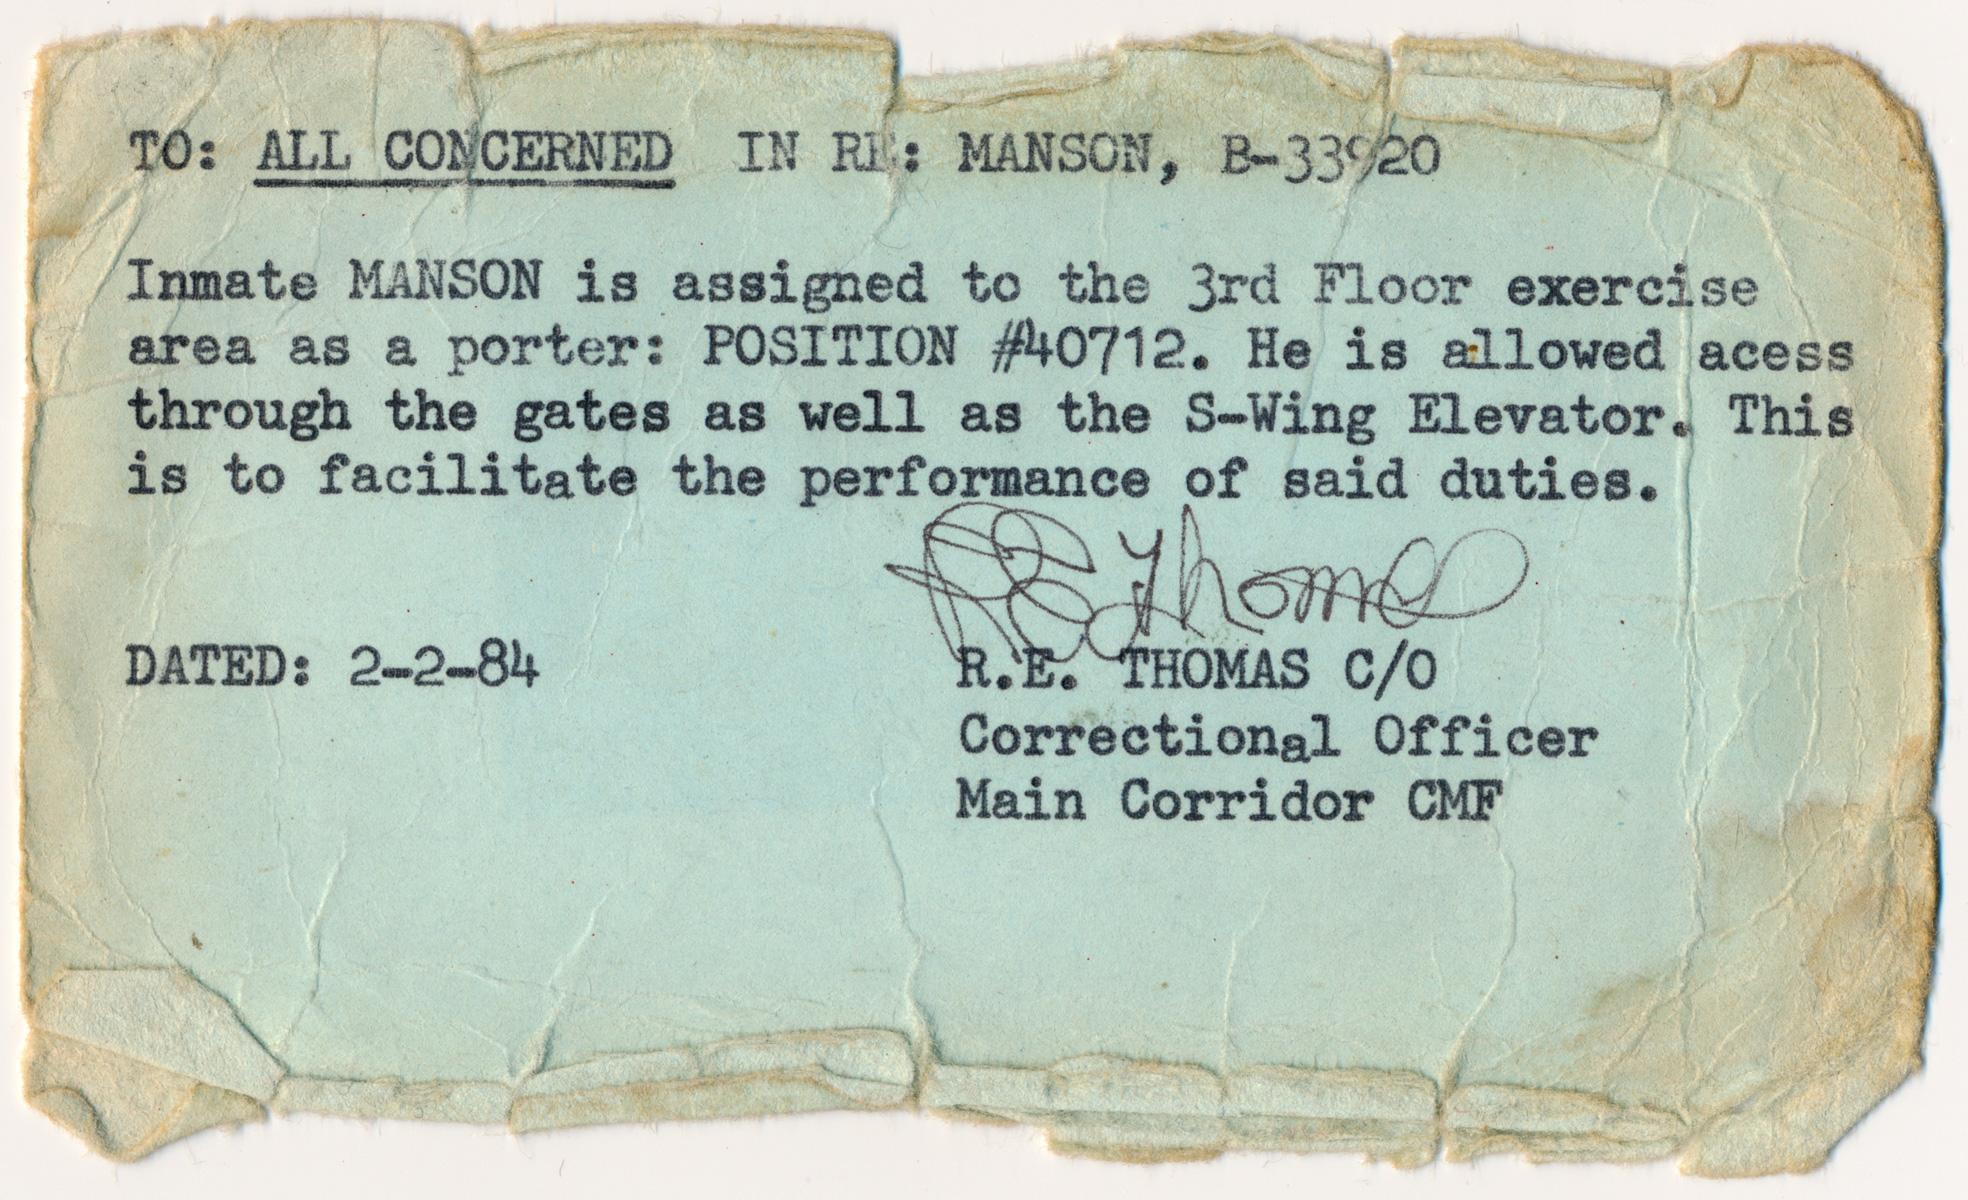 CHARLES MANSON PRISON PASS